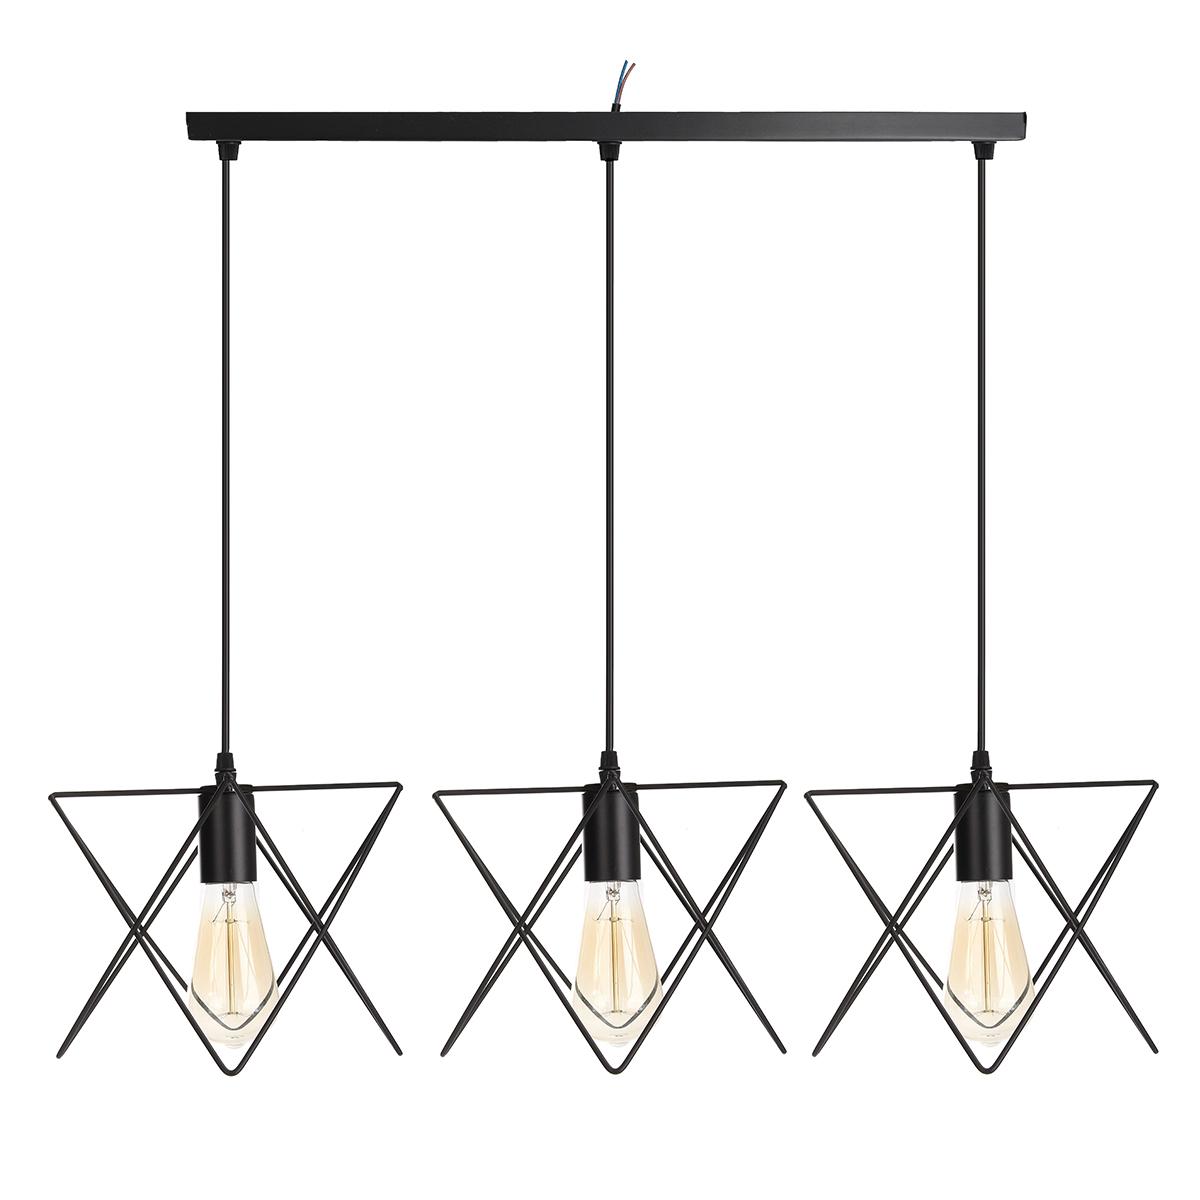 3 In 1 Metal Vintage Ceiling Light Pendant Lamp Cage